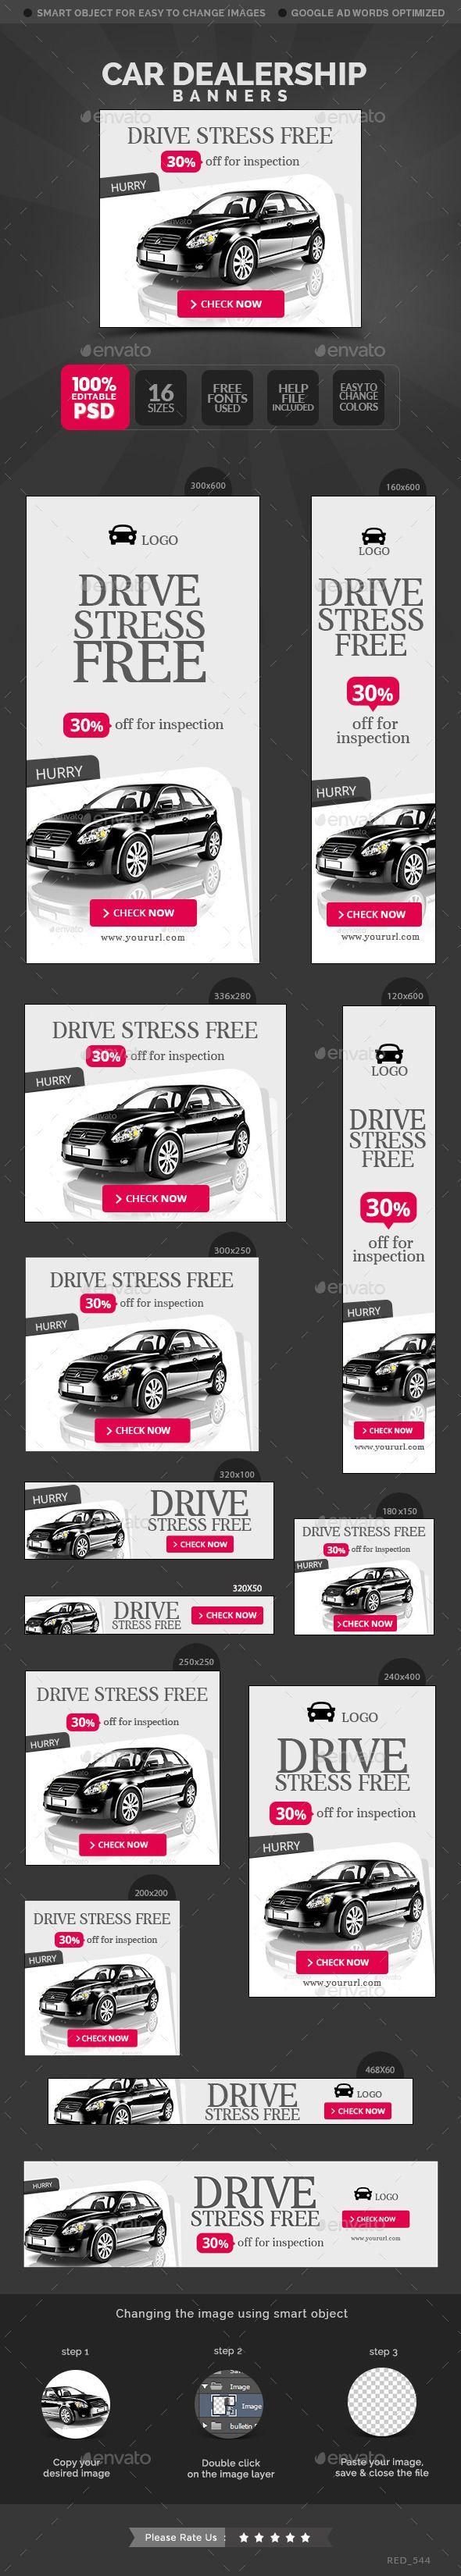 Car Dealership Banners Template #design Download: http://graphicriver.net/item/car-dealership-banners/12594326?ref=ksioks